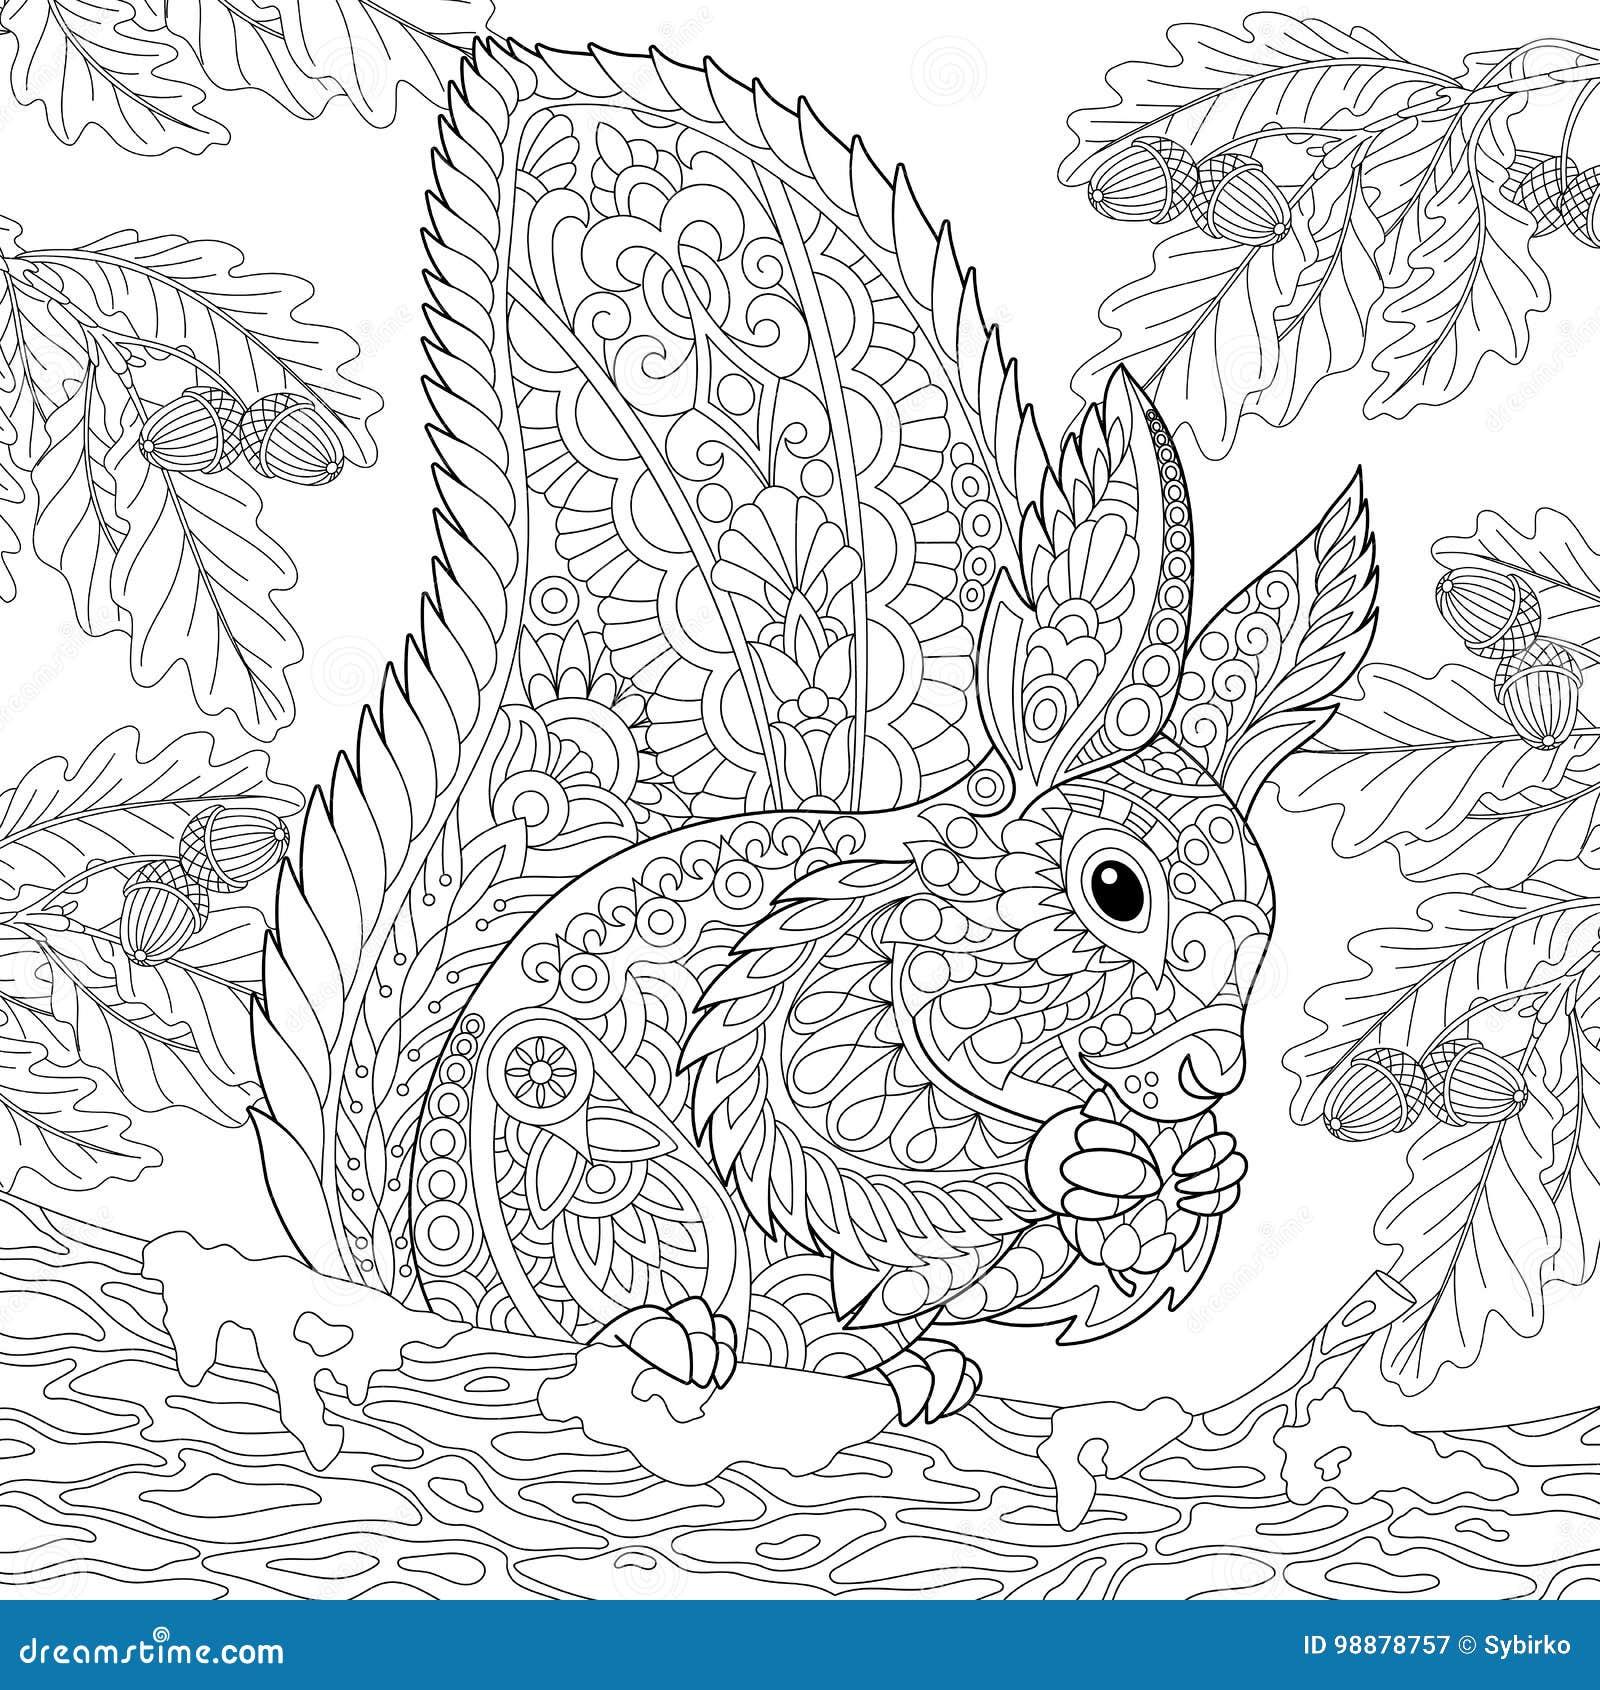 Zentangle Stylized Squirrel Stock Vector